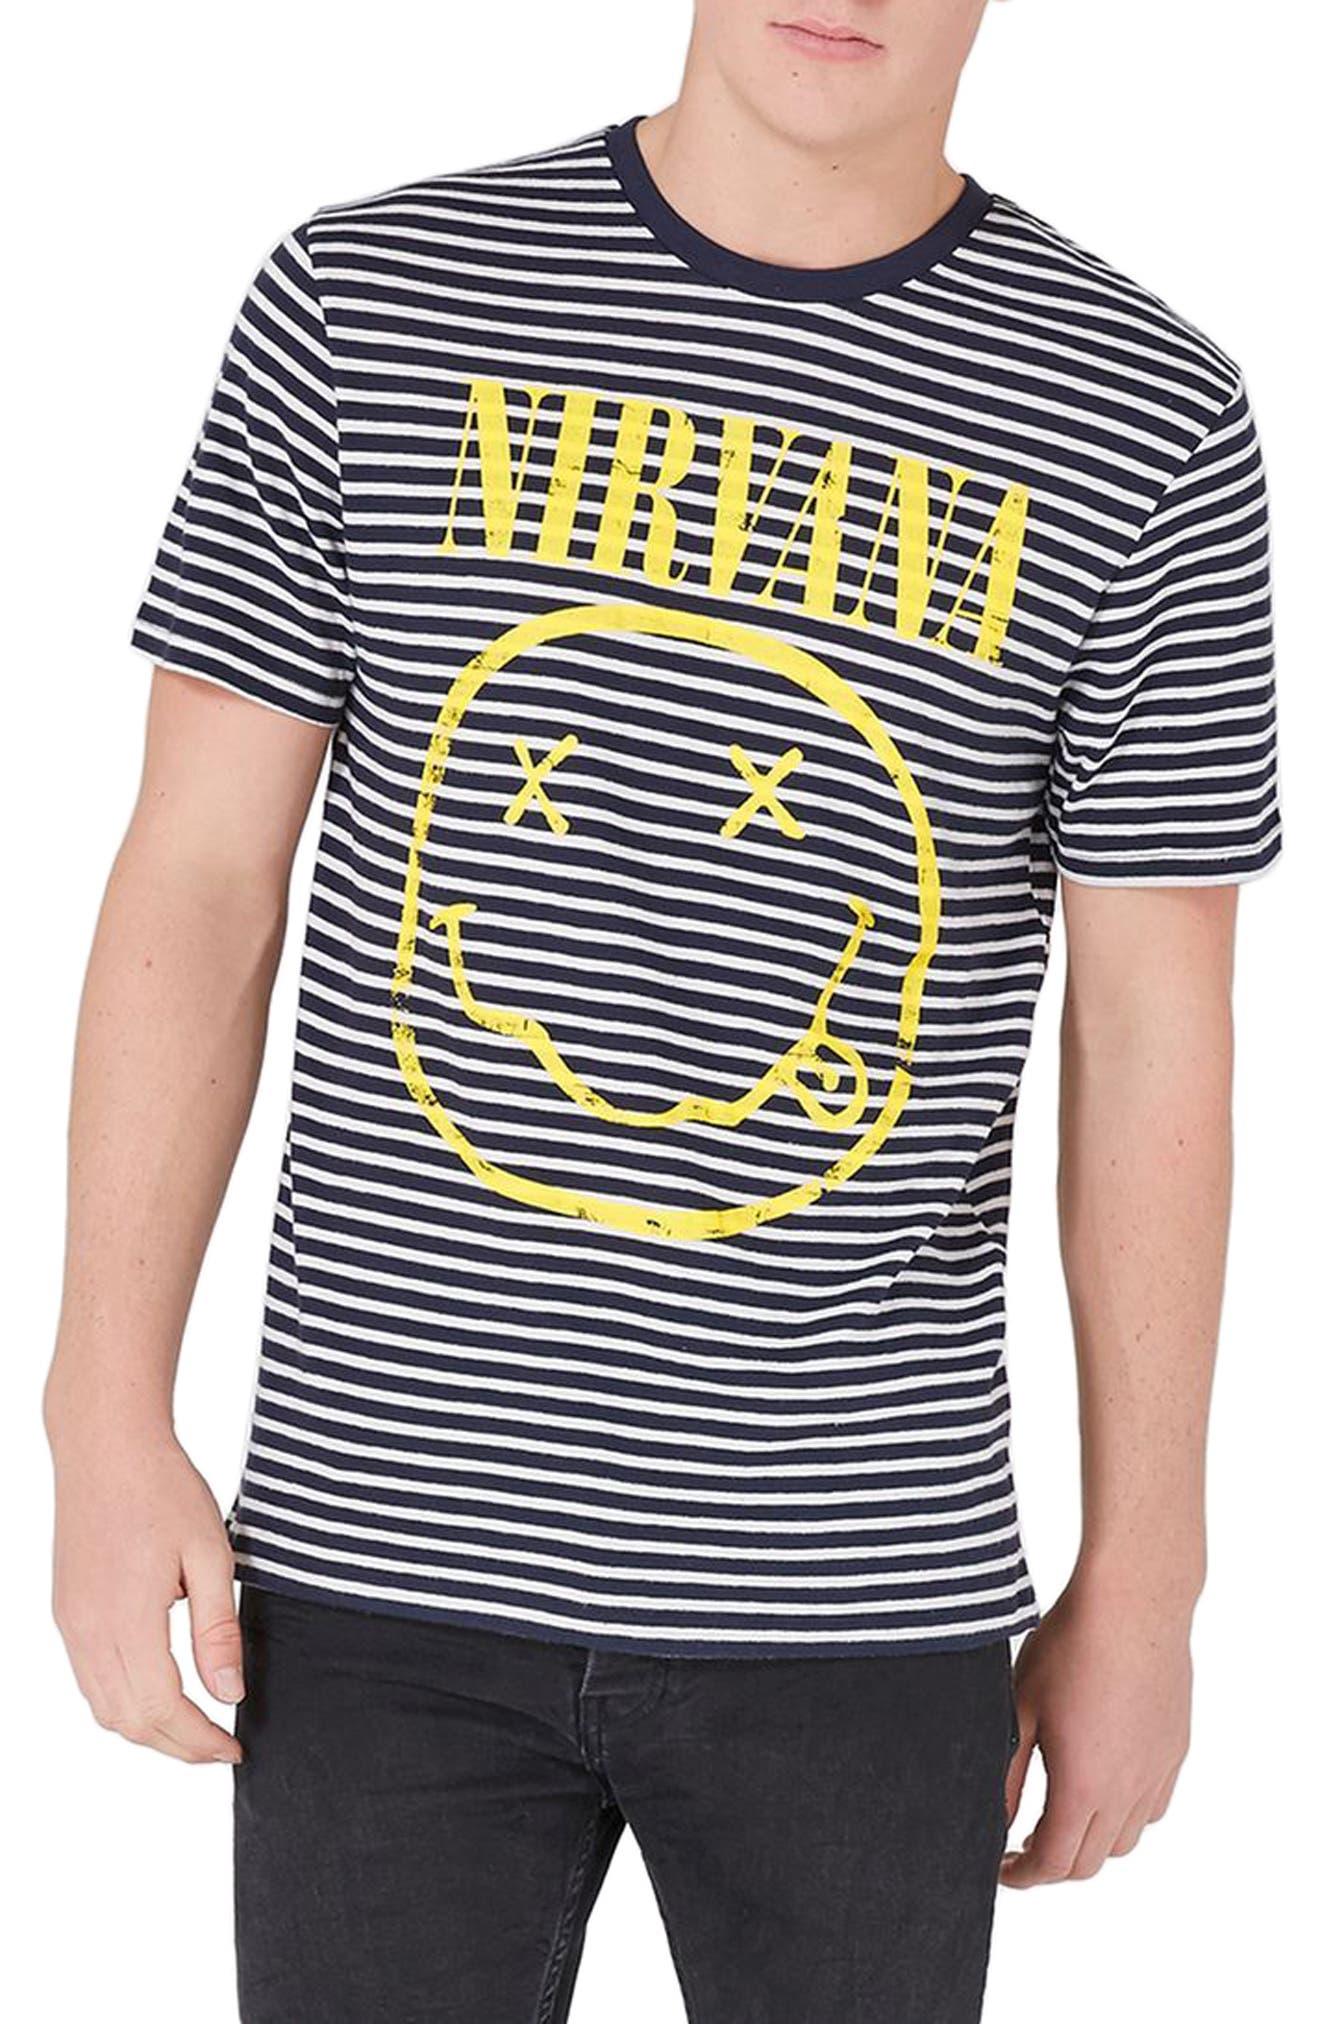 Topman Nirvana Stripe T-Shirt